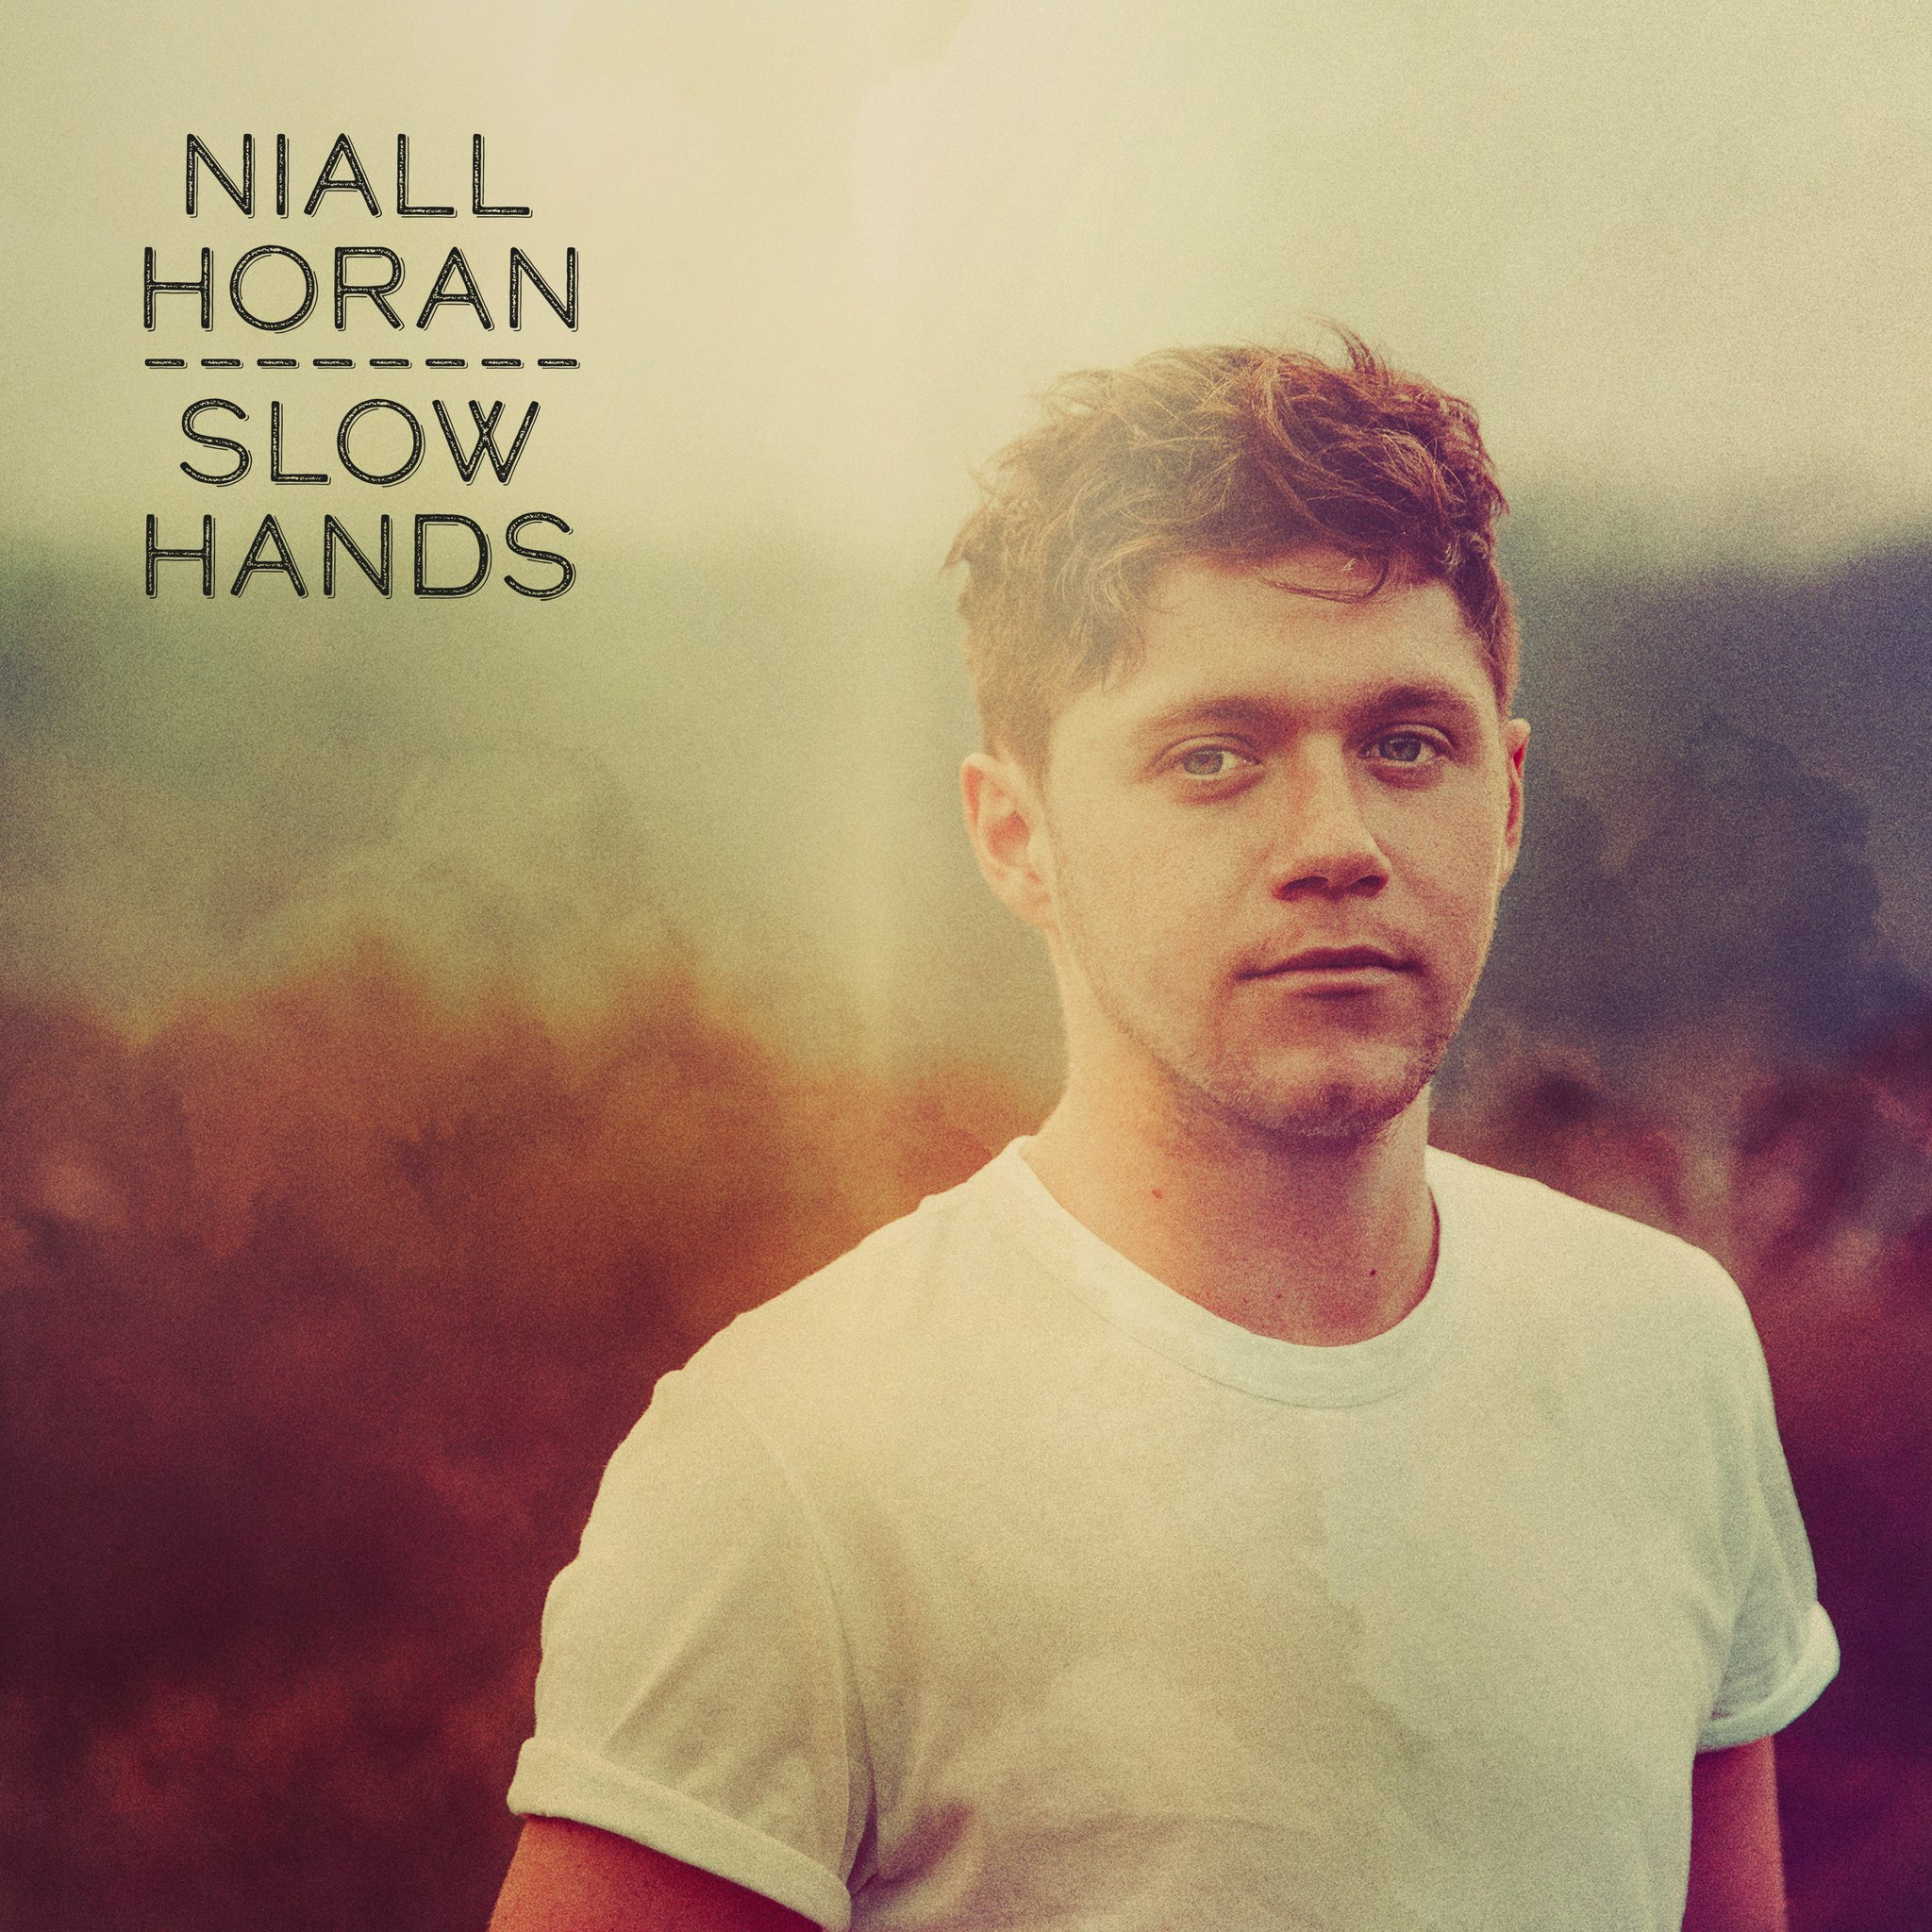 Niall Horan ... Niall Horan Slow Hands